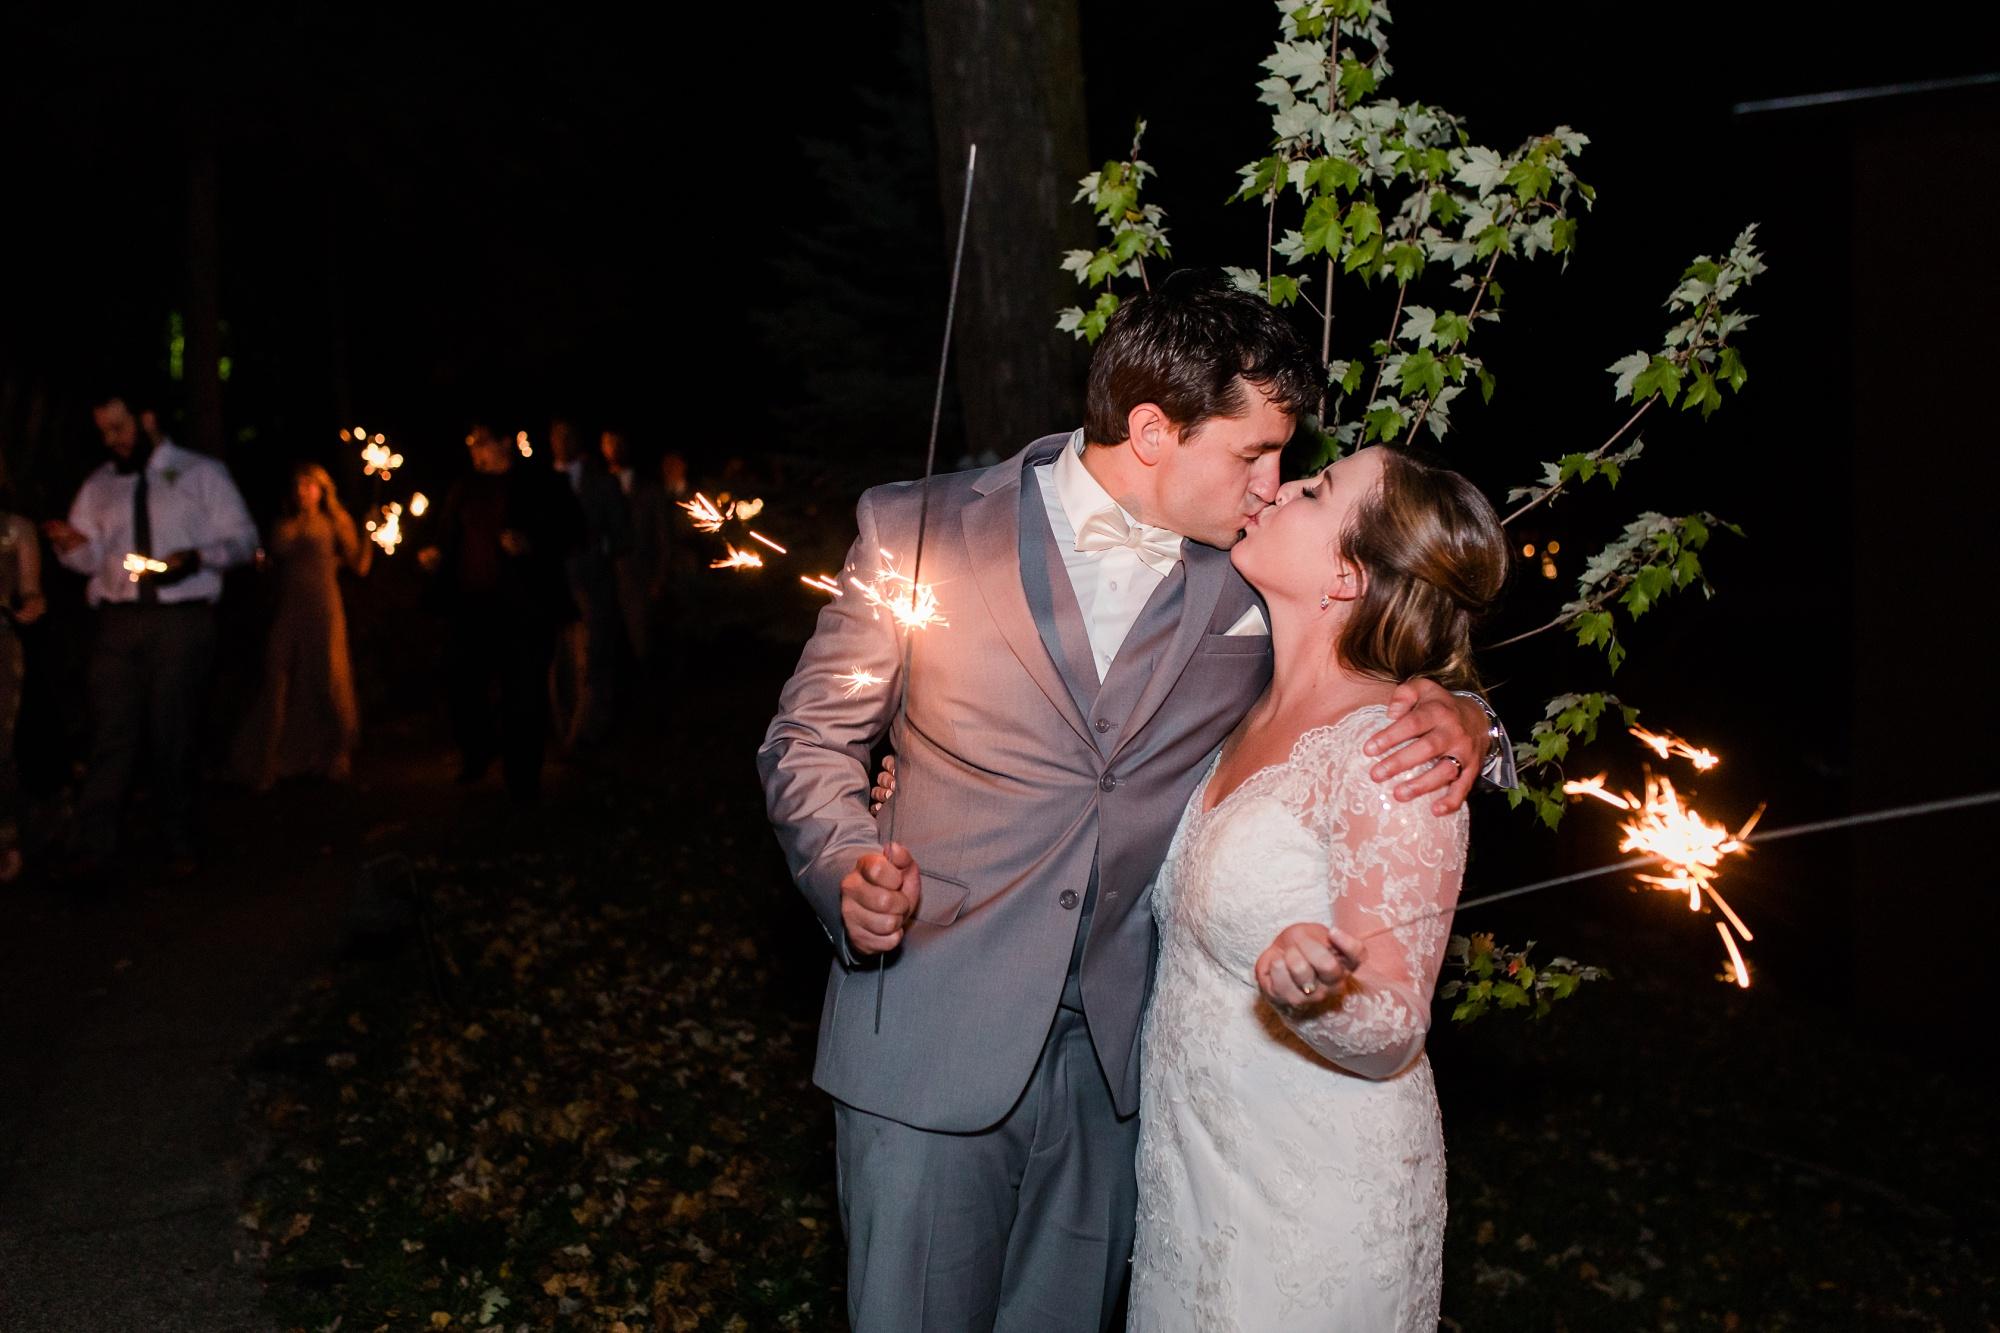 AmberLangerudPhotography_Fair Hills Resort Lakeside Wedding in Minnesota_3492.jpg